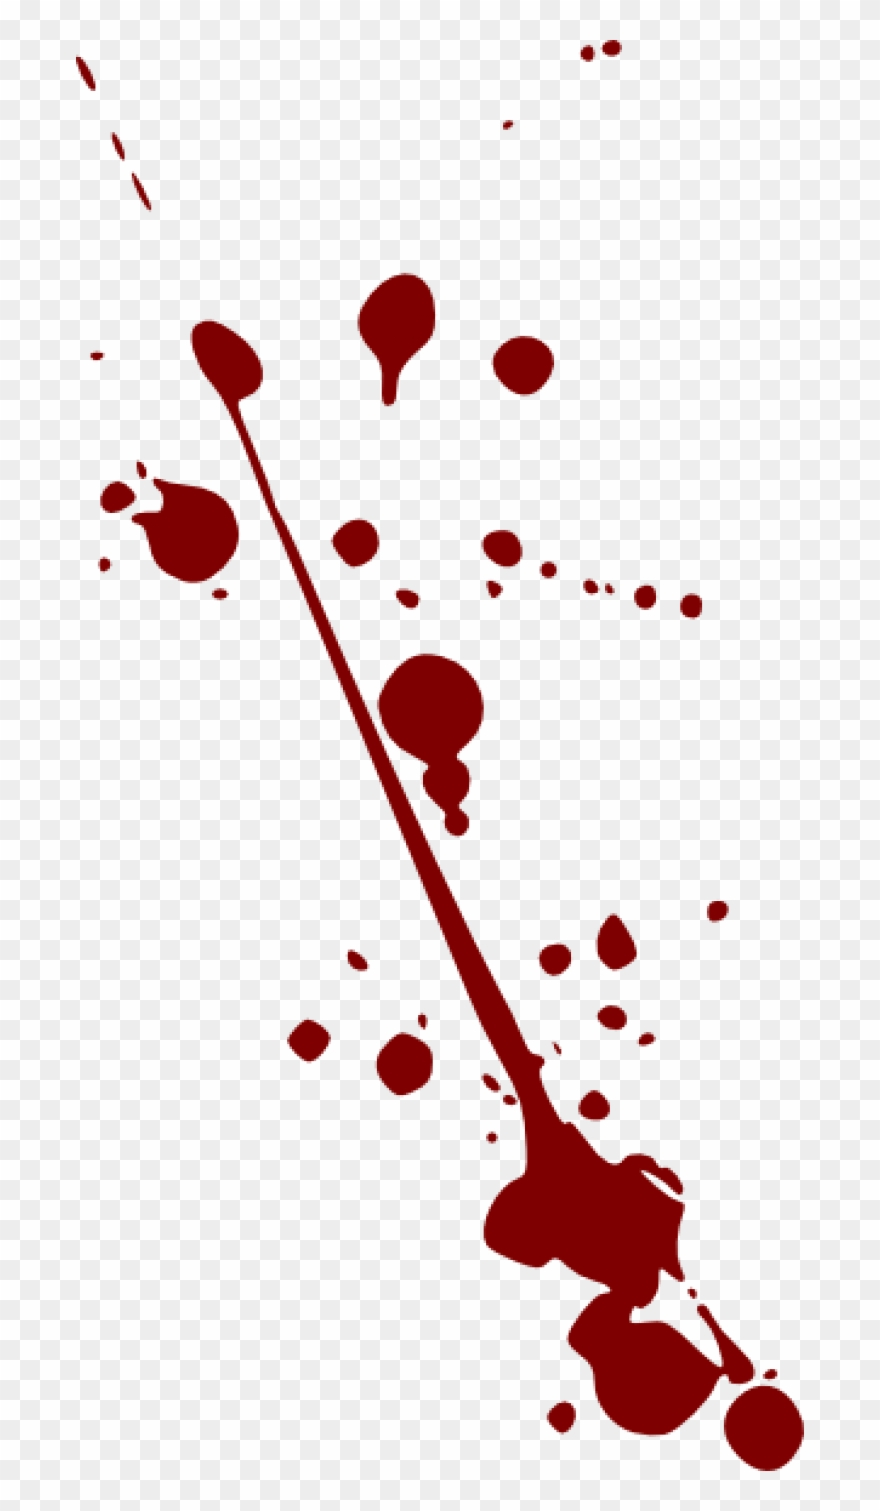 competitive price a4740 010d1 Blood Splatter Clipart Blood Splatter Clip Art At Clker - Blood Splatter  Gif Transparent - Png